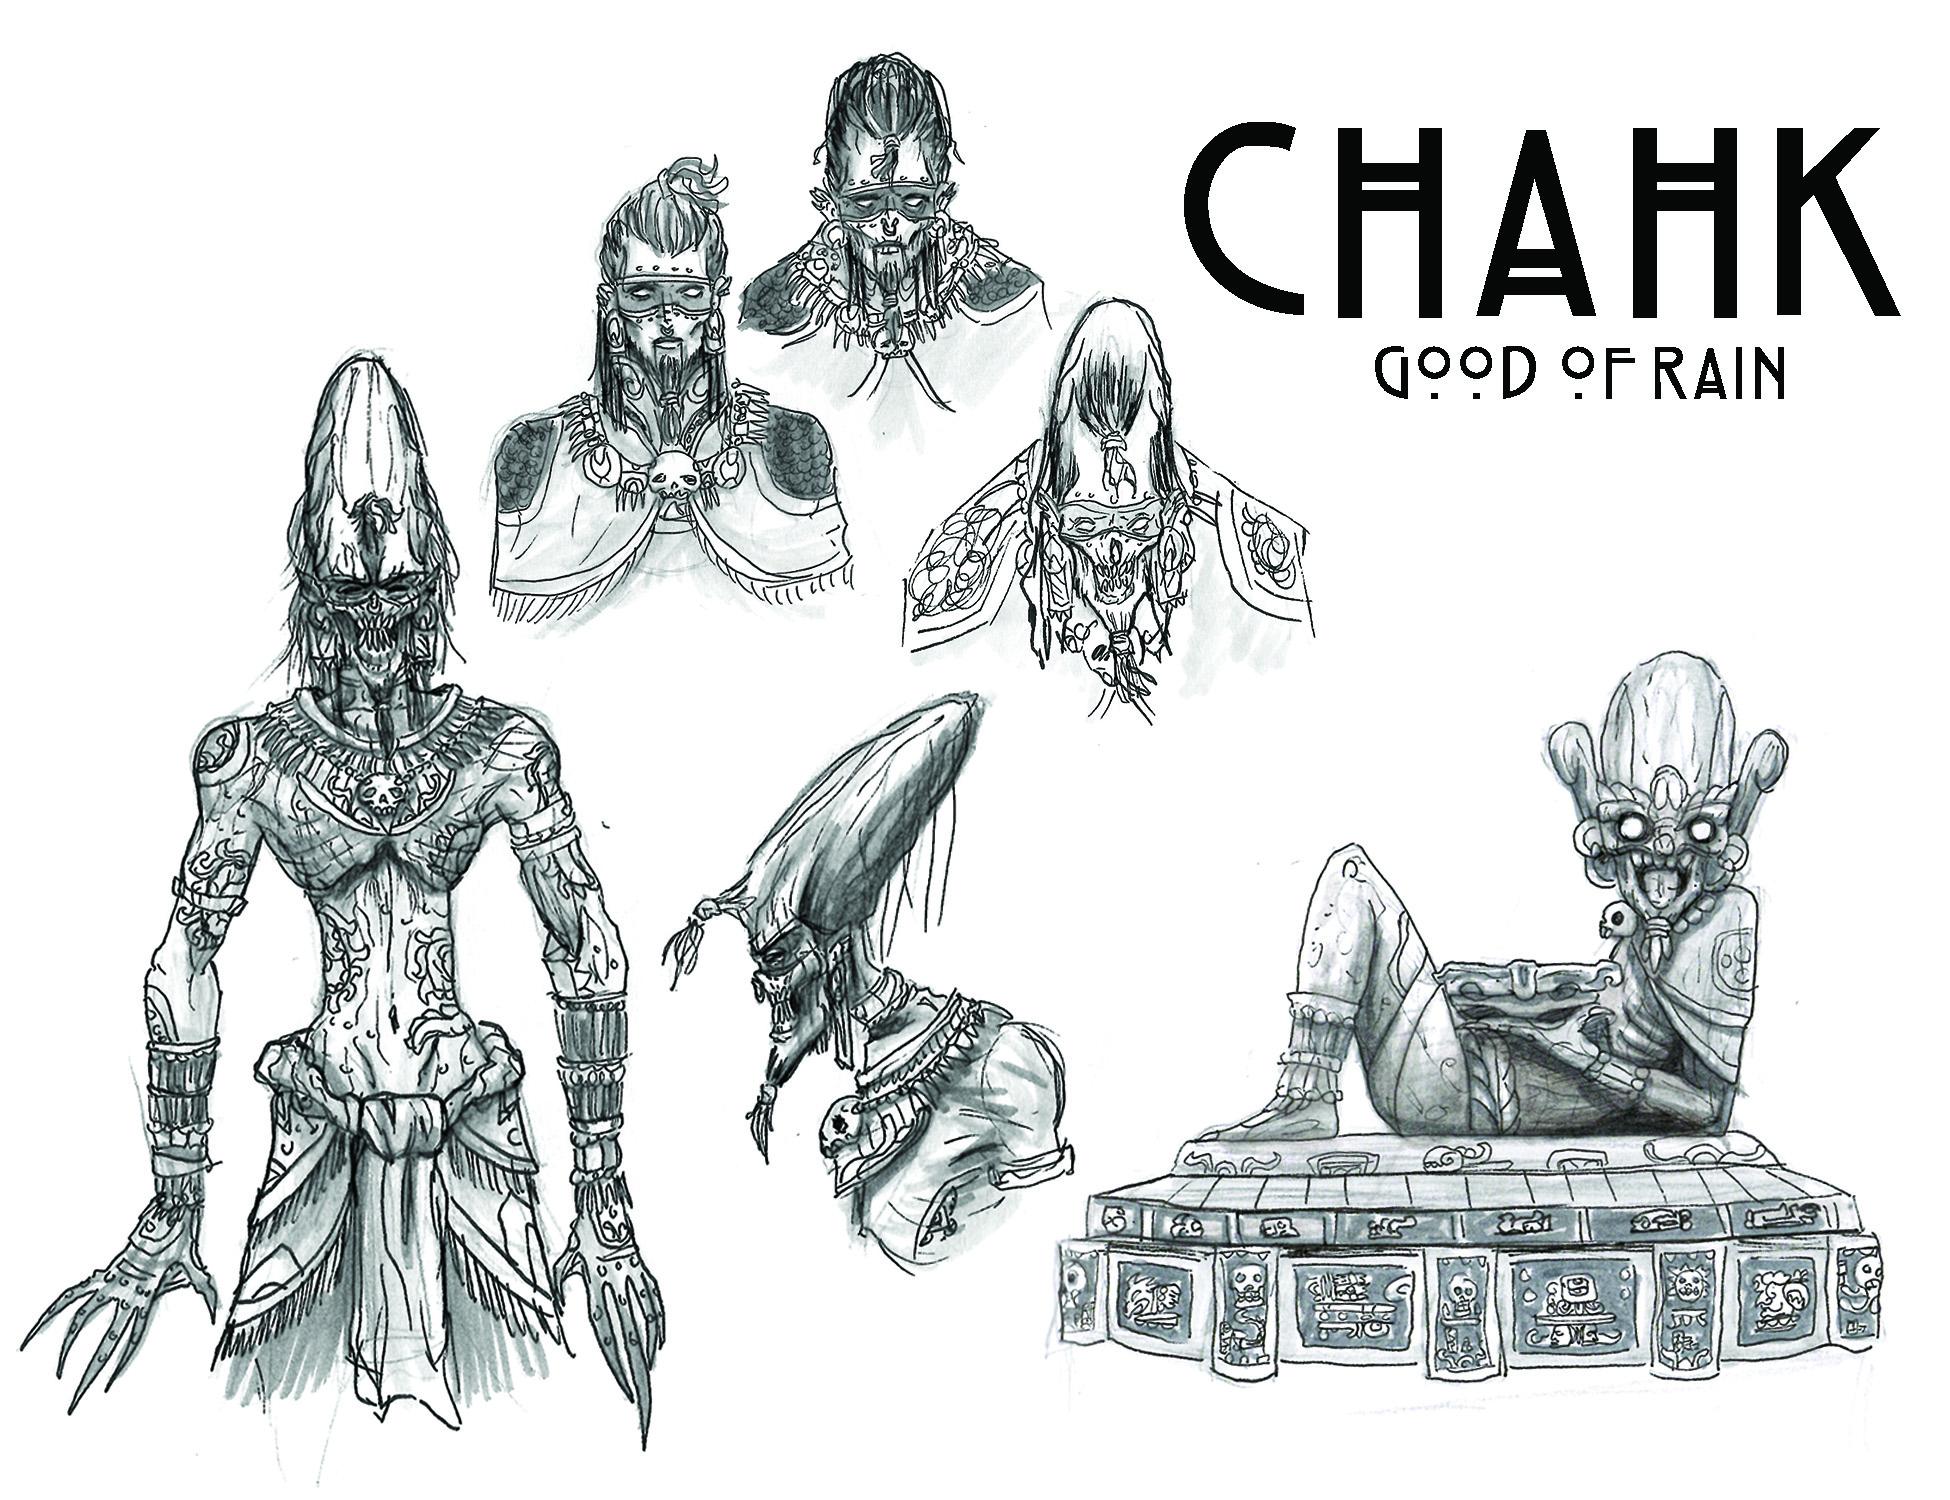 Chalk_CharecterD01-150dpi.jpg